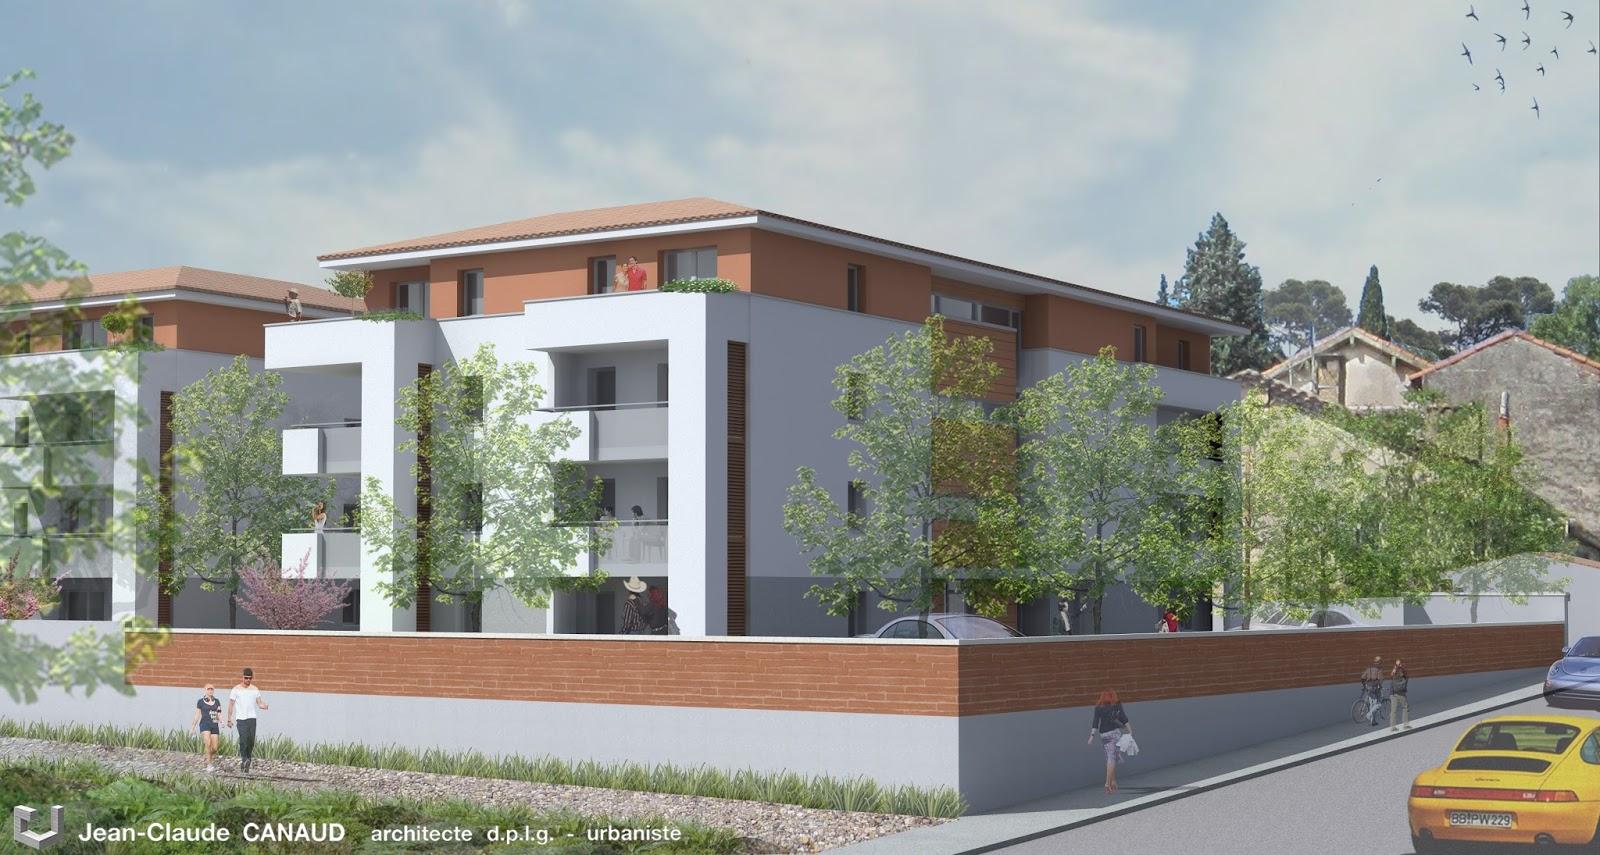 canaud architecte projet de logements collectifs gard. Black Bedroom Furniture Sets. Home Design Ideas